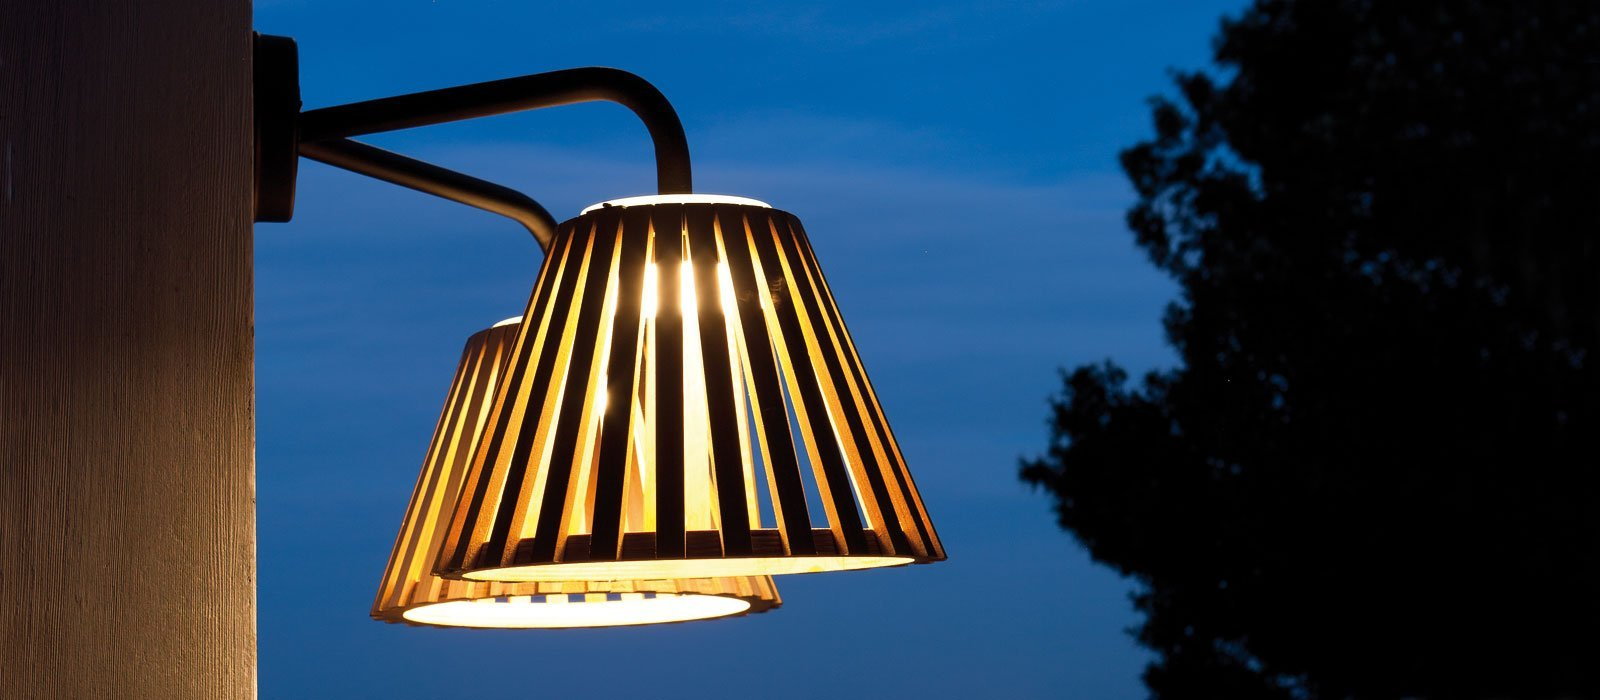 Lampada MIZAR da giardino a Salerno da Montella Prisma Arredo